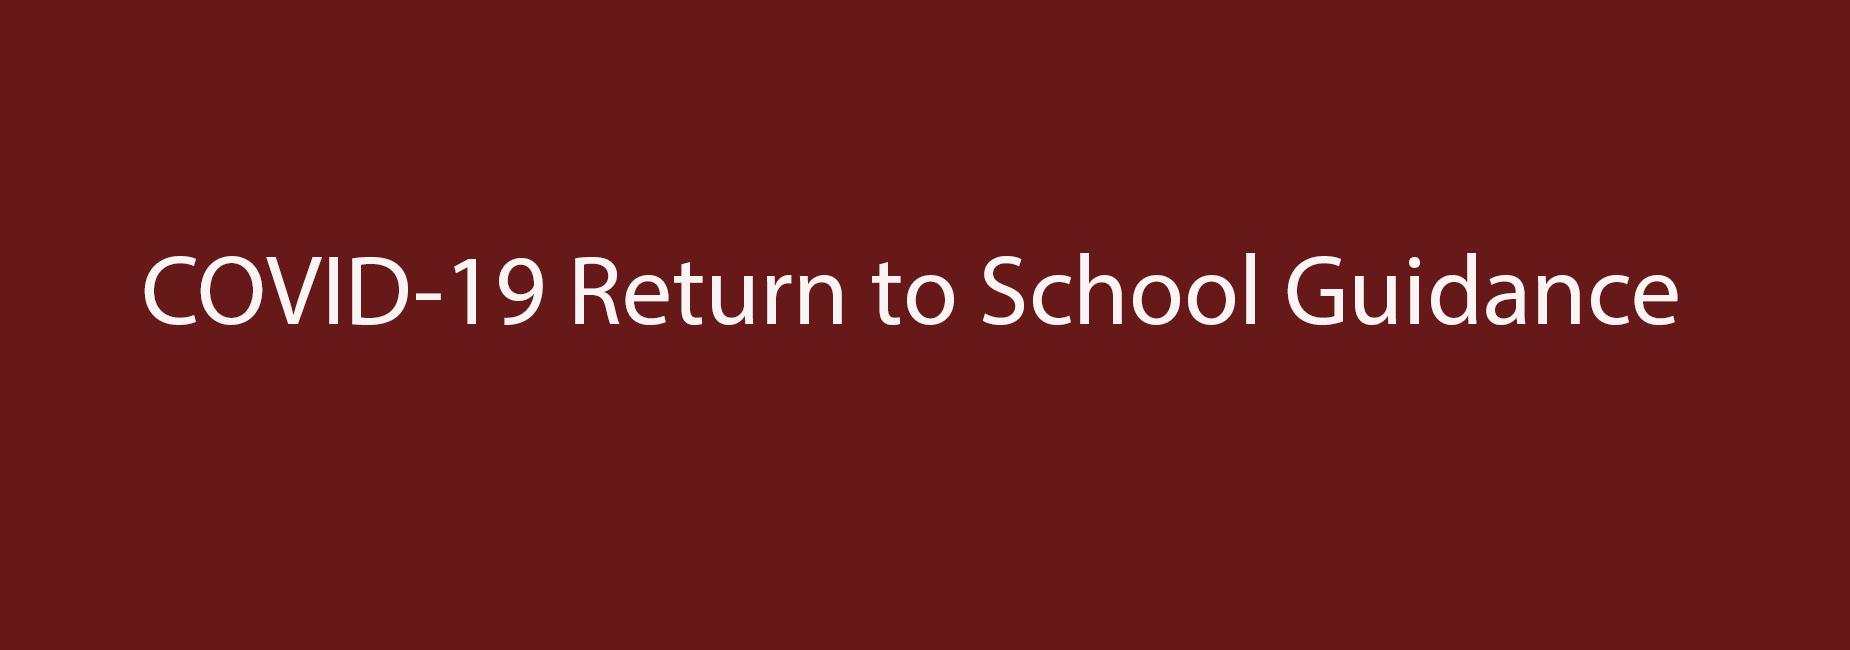 COVID-19 Return to School Guidance